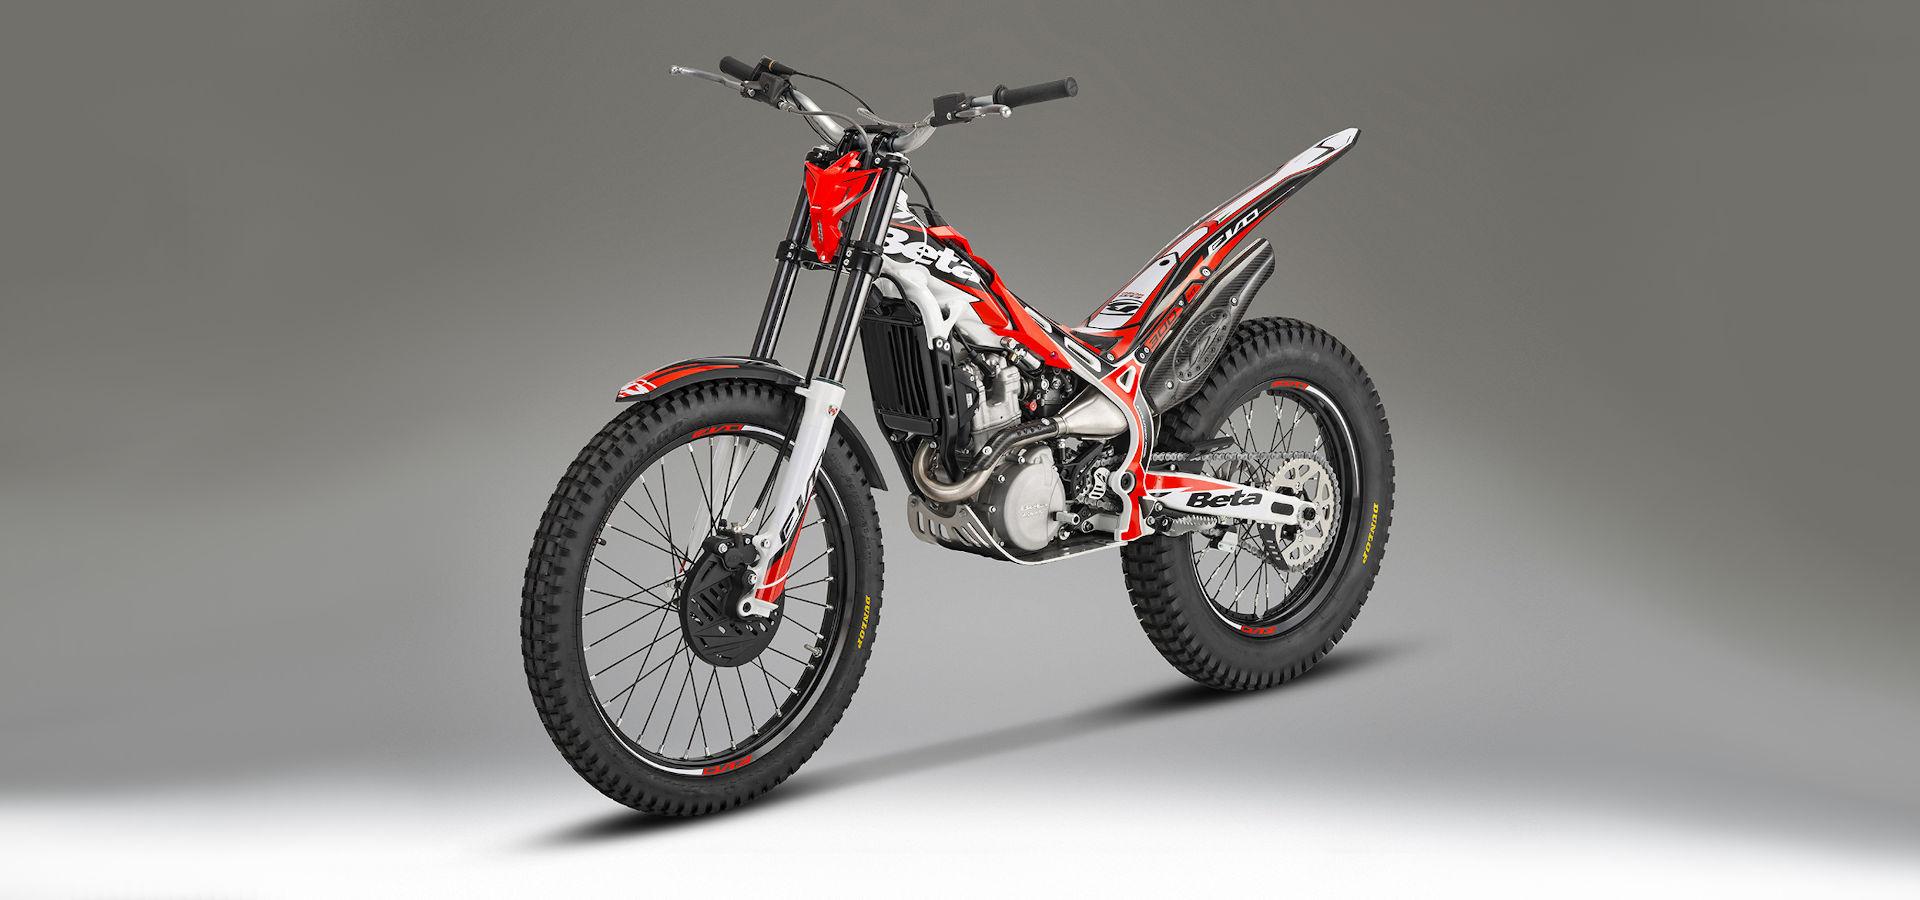 RR 125 2T MY 2022   Visintin Moto